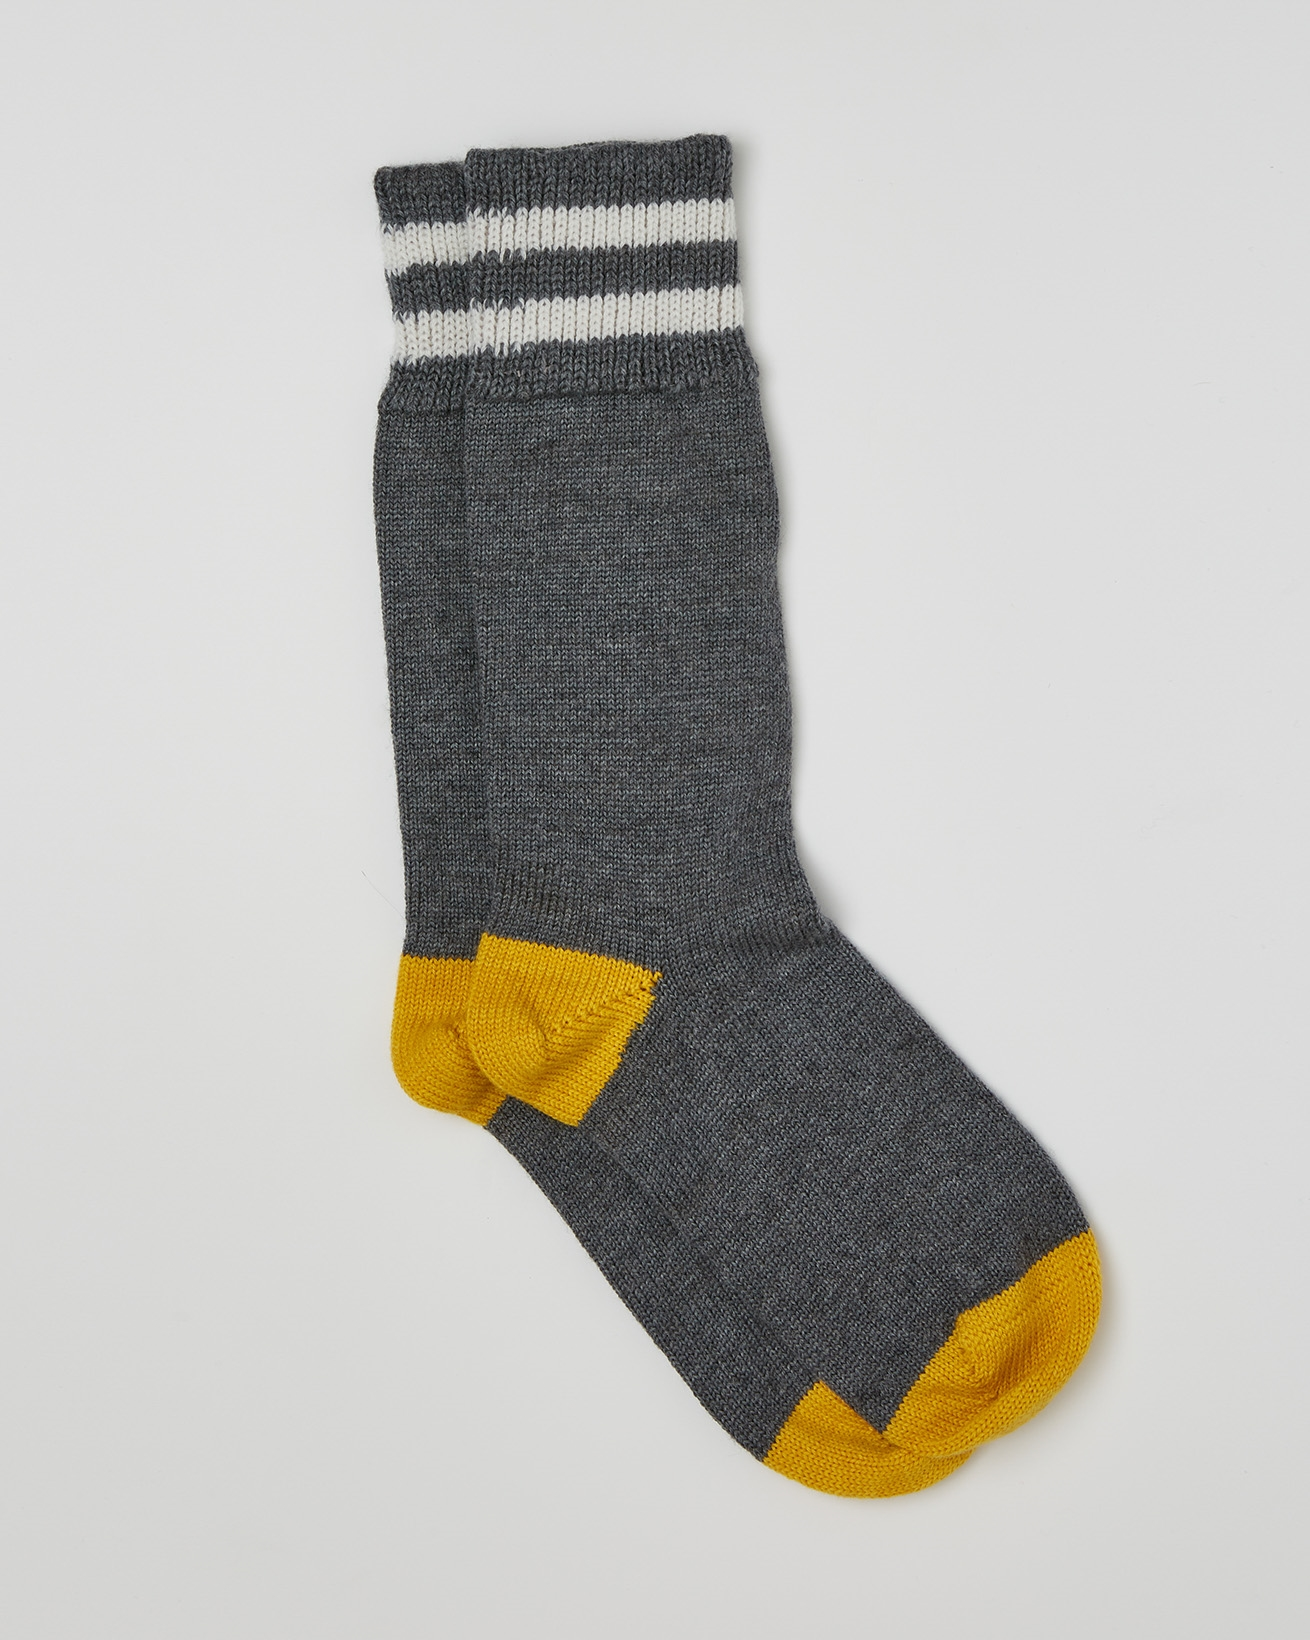 Ladies Merino Cotton Socks - Size Medium - Derby Grey, Gorse - 2464